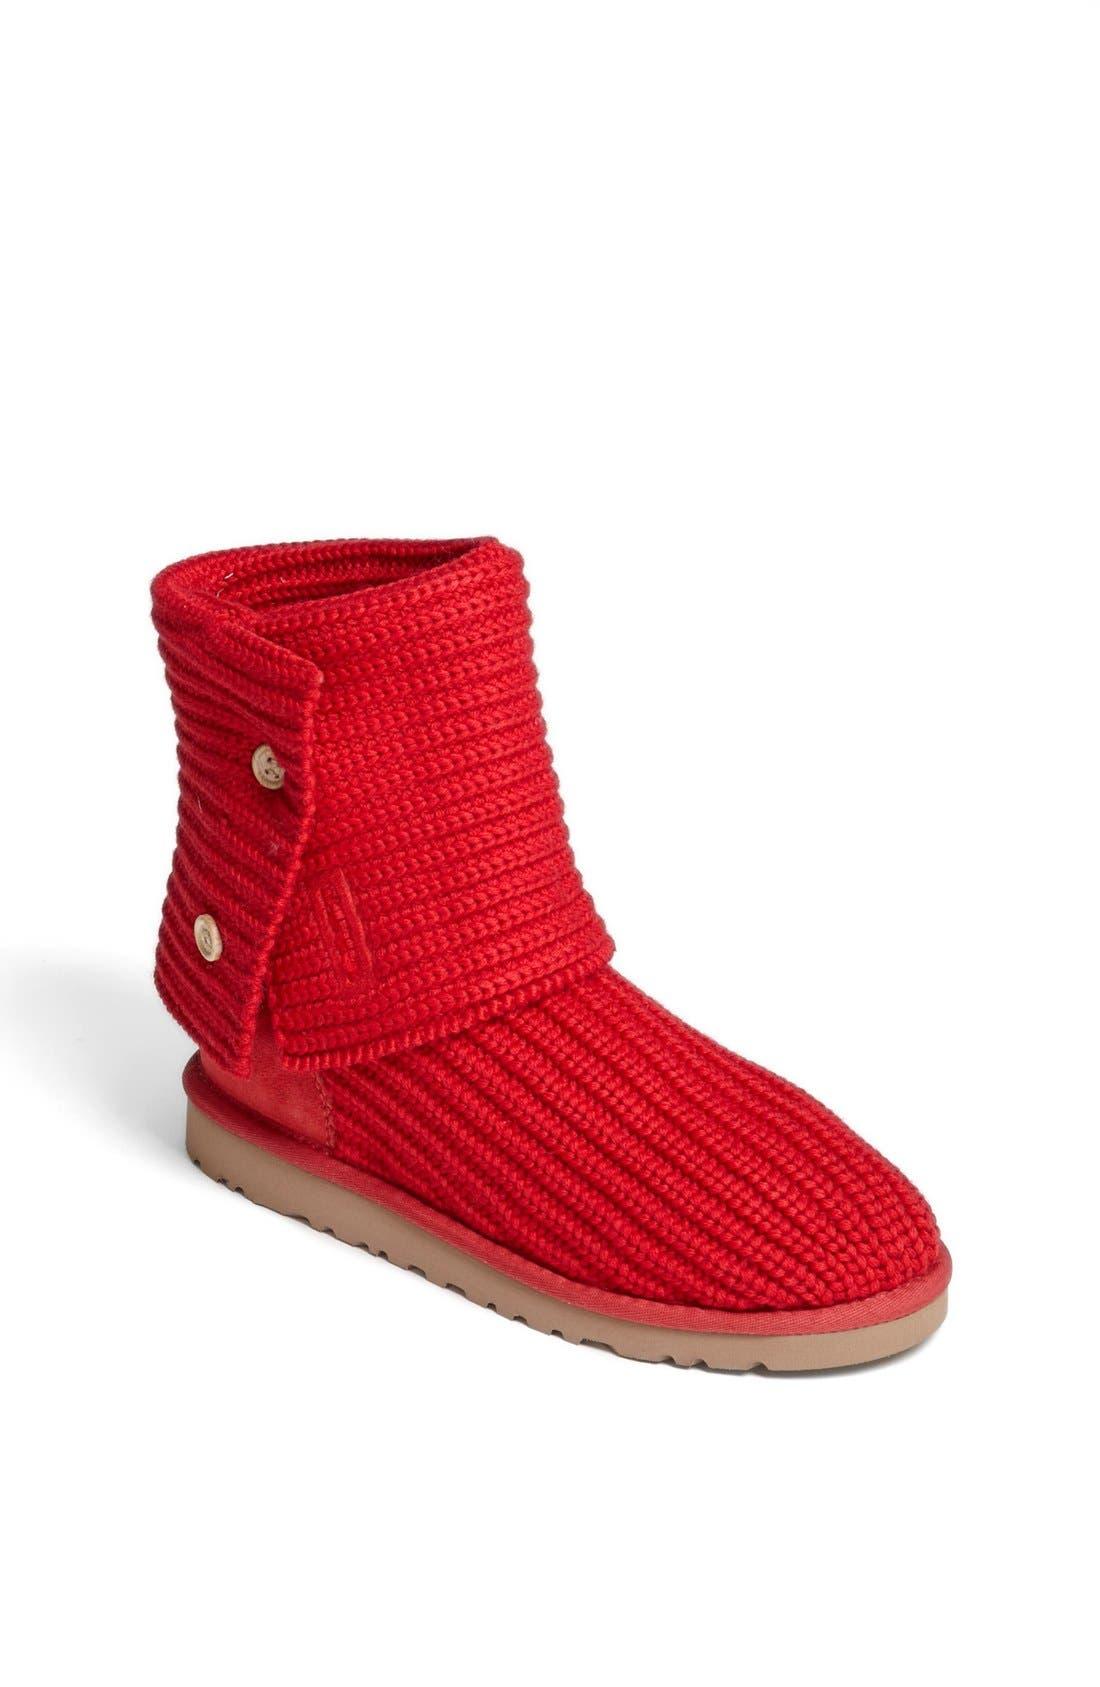 Alternate Image 1 Selected - UGG® 'Cardy' Crochet Boot (Toddler, Little Kid & Big Kid)